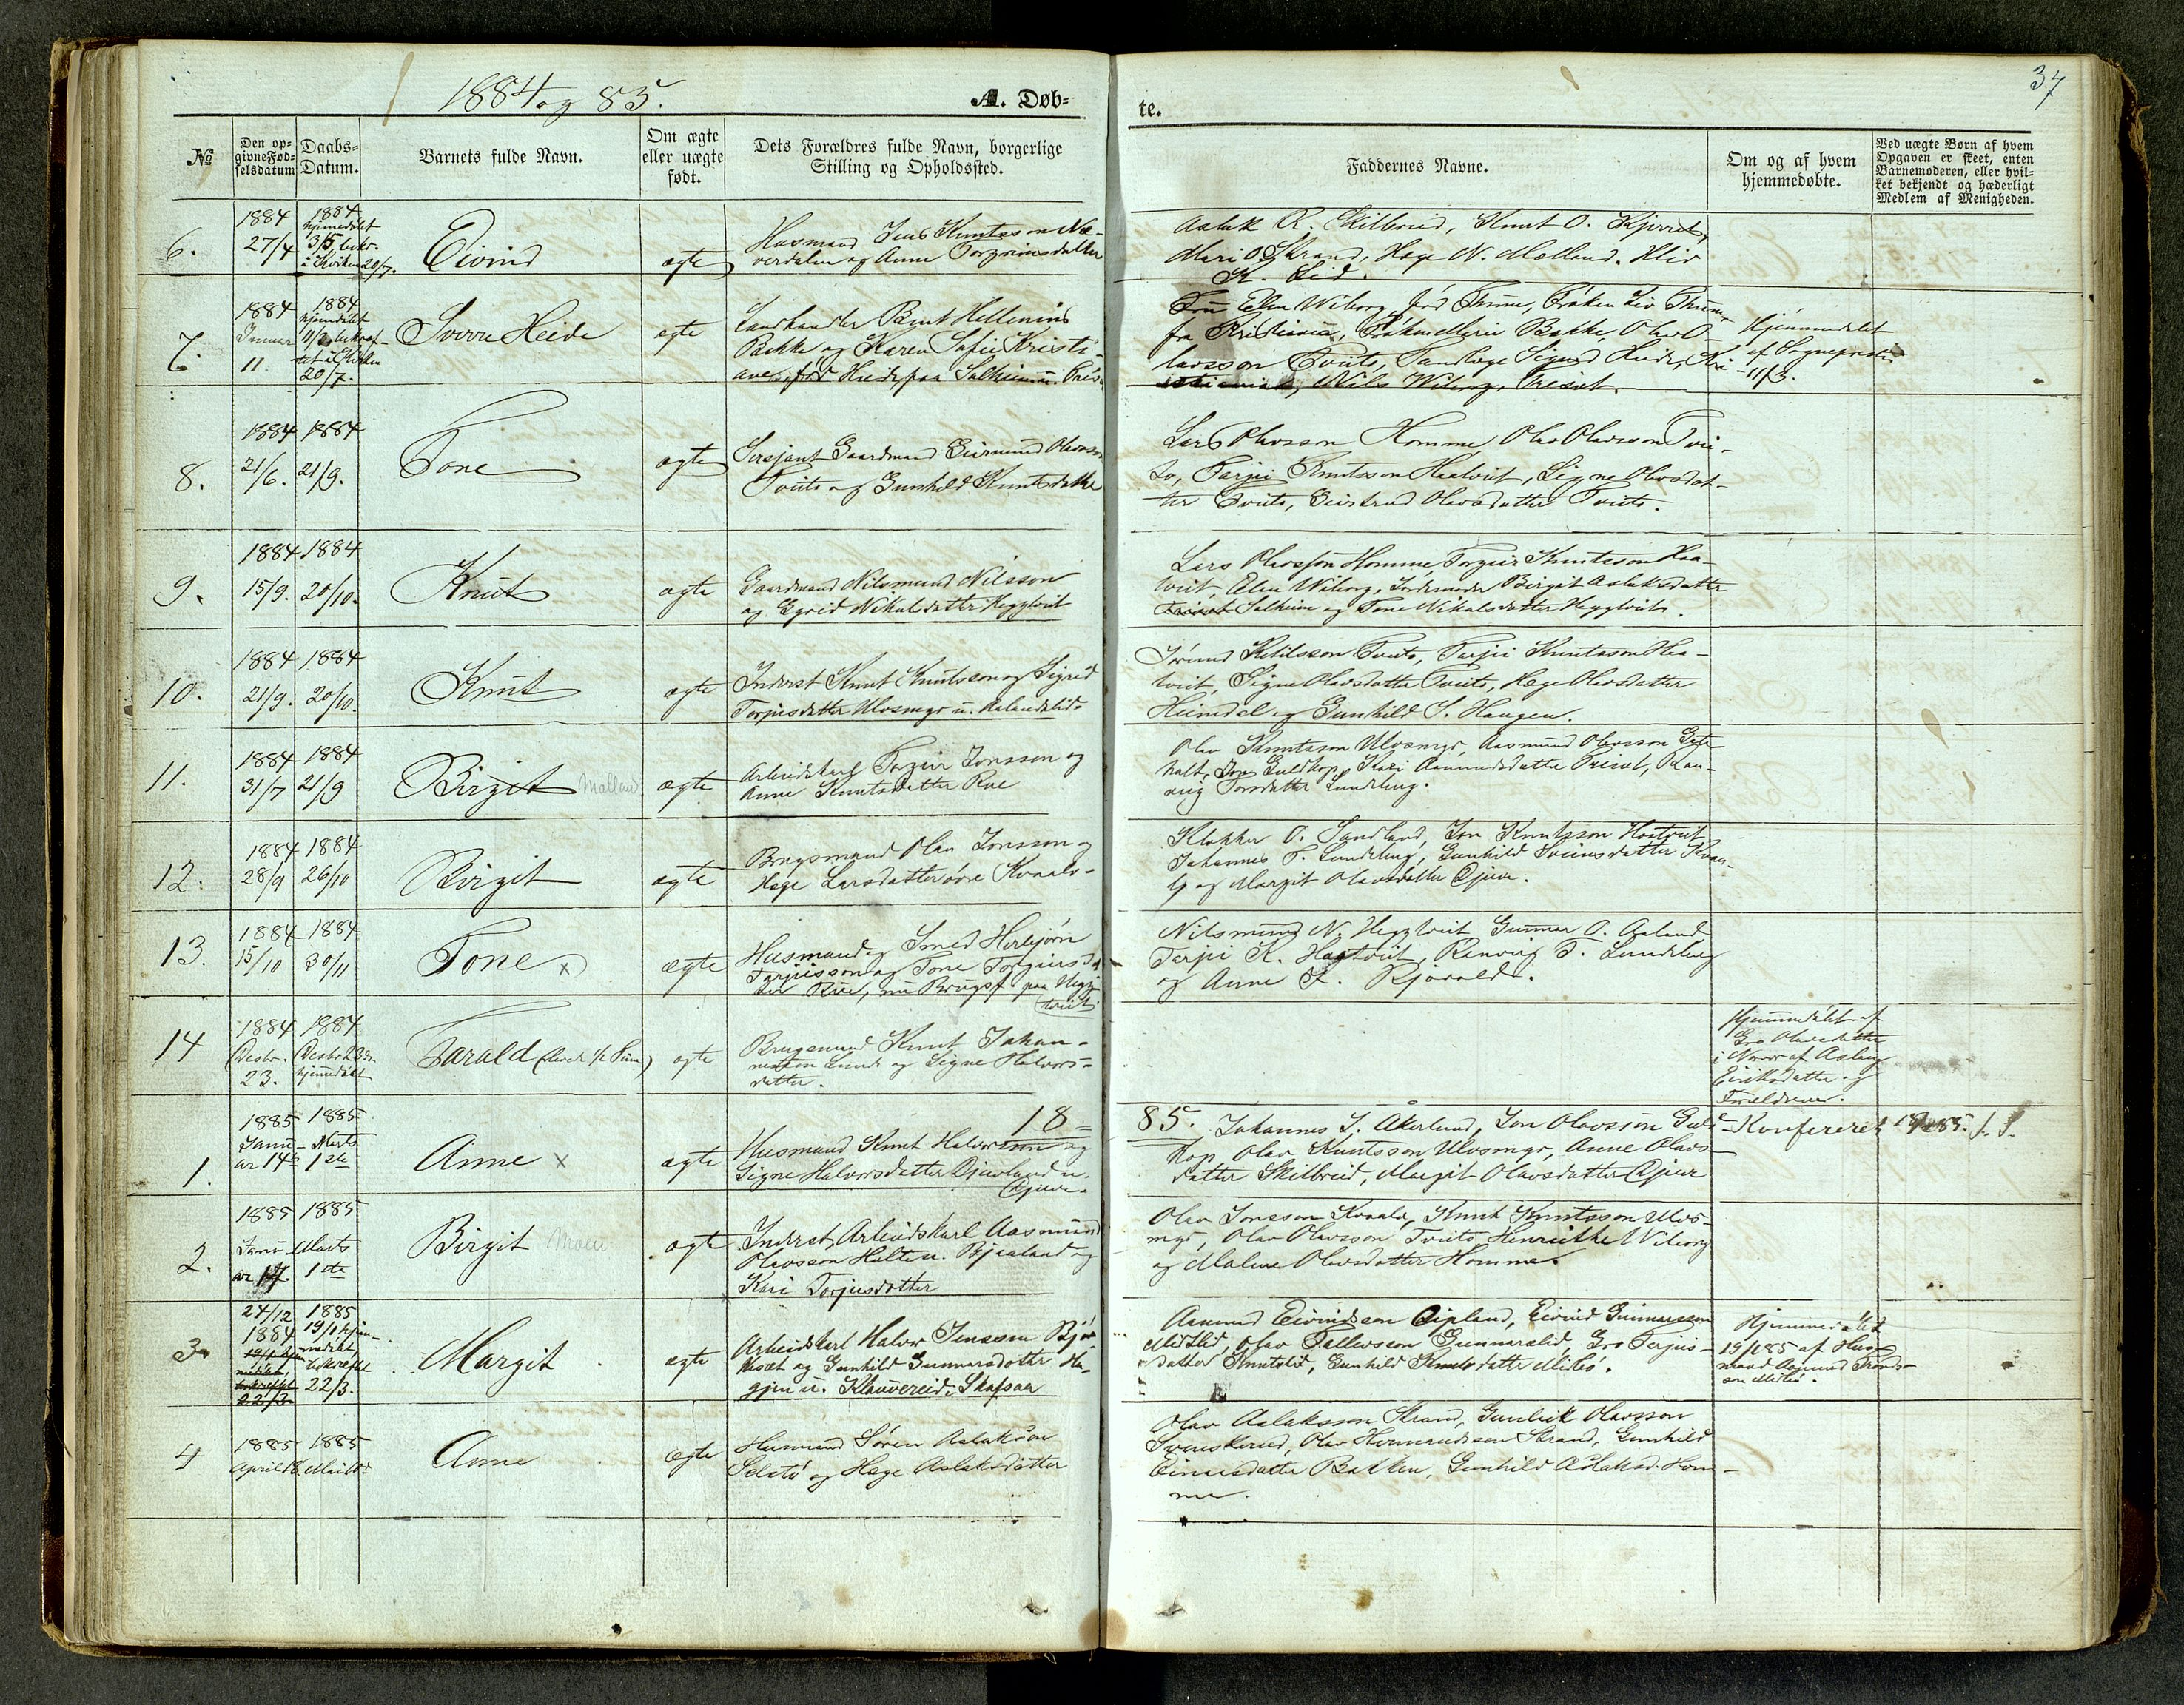 SAKO, Lårdal kirkebøker, G/Ga/L0002: Klokkerbok nr. I 2, 1861-1890, s. 37